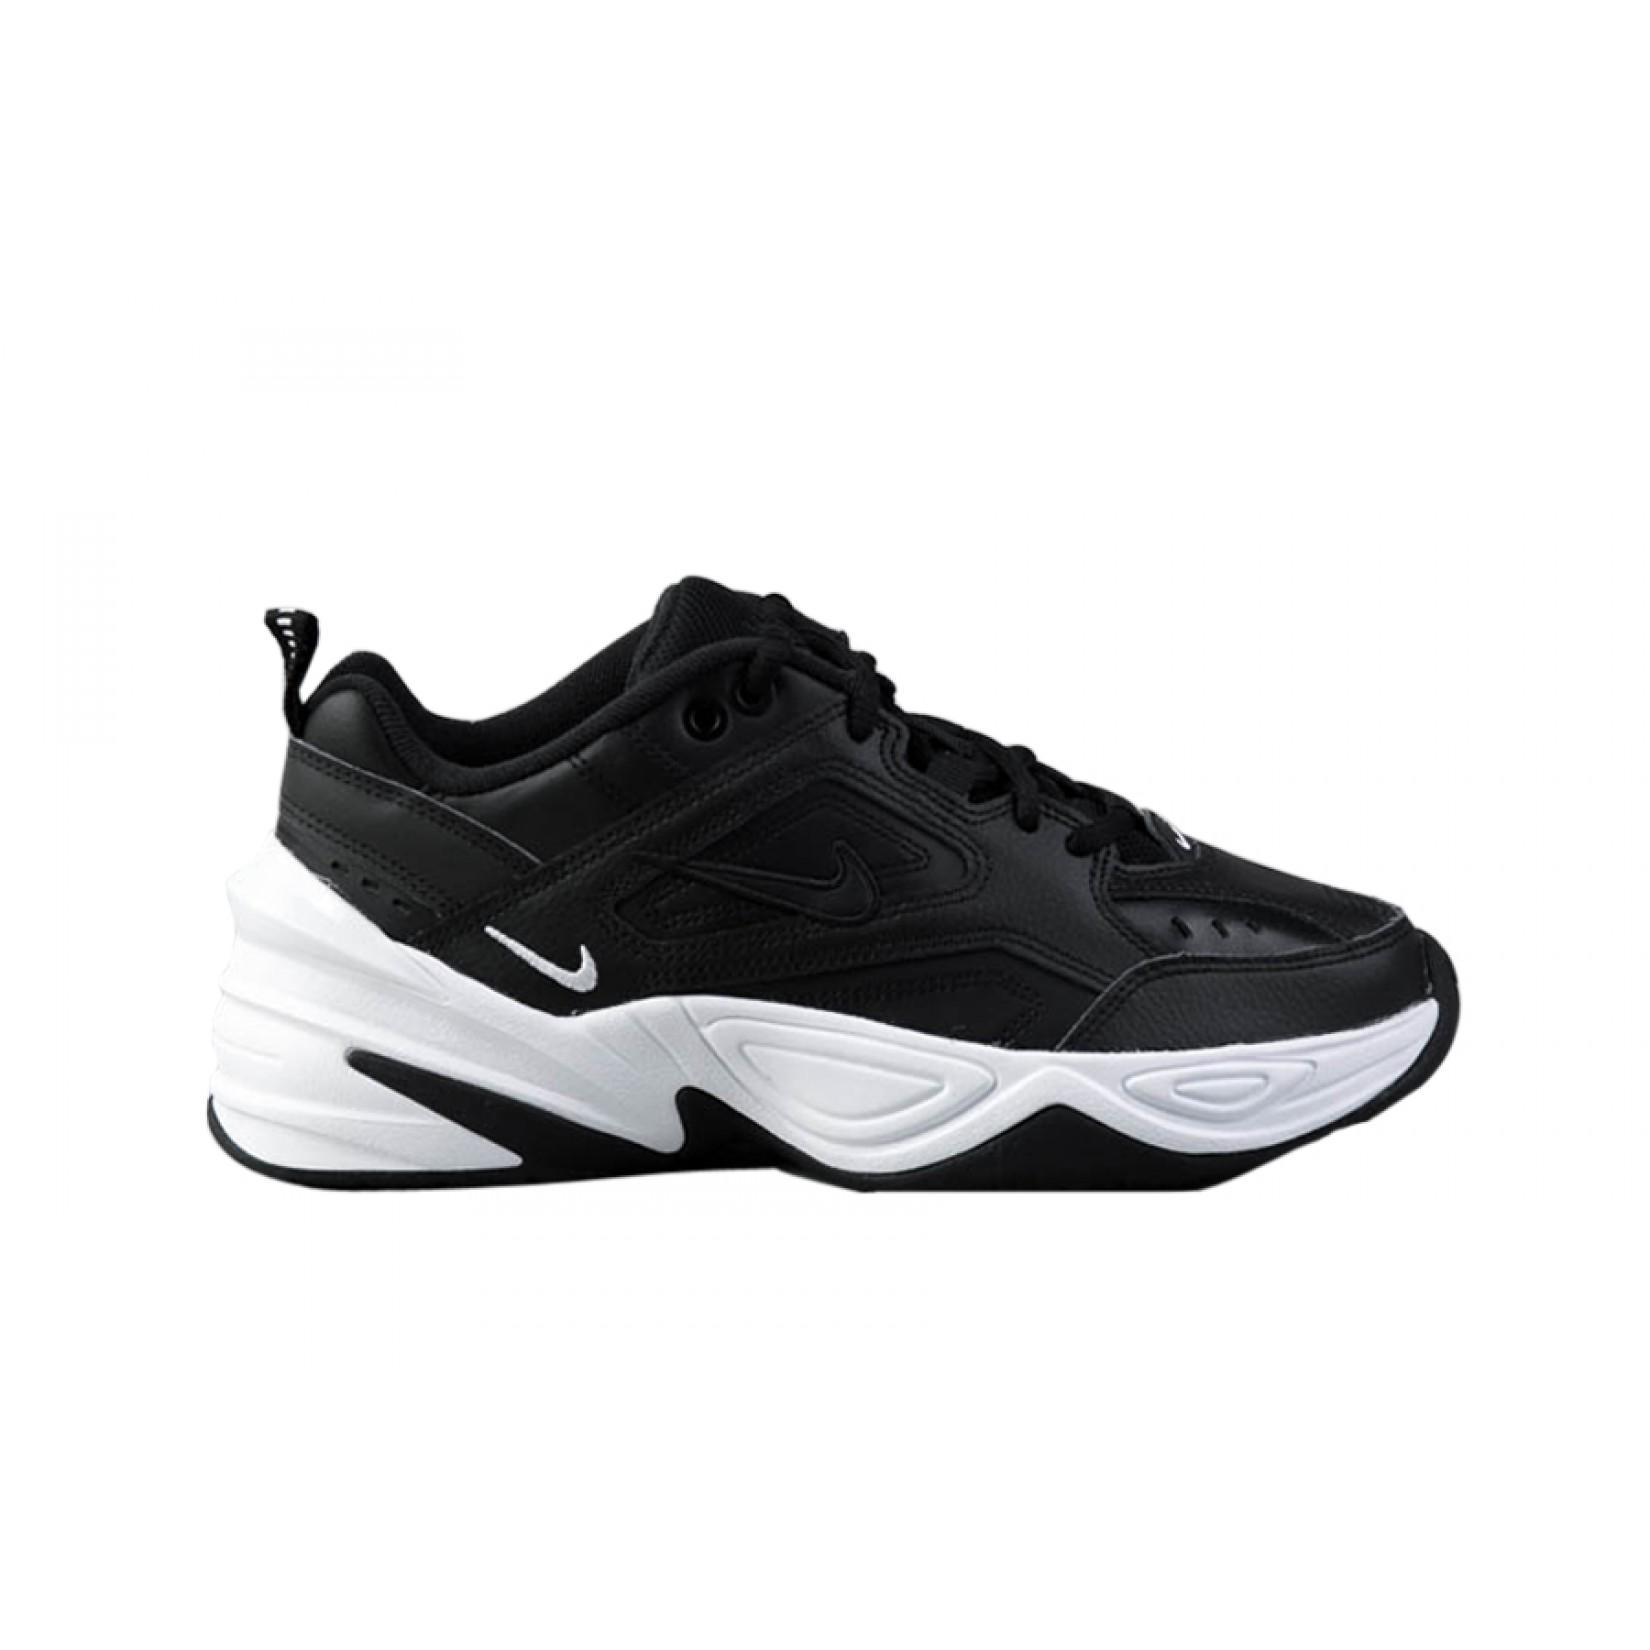 Nike M2K Tekno Black - White